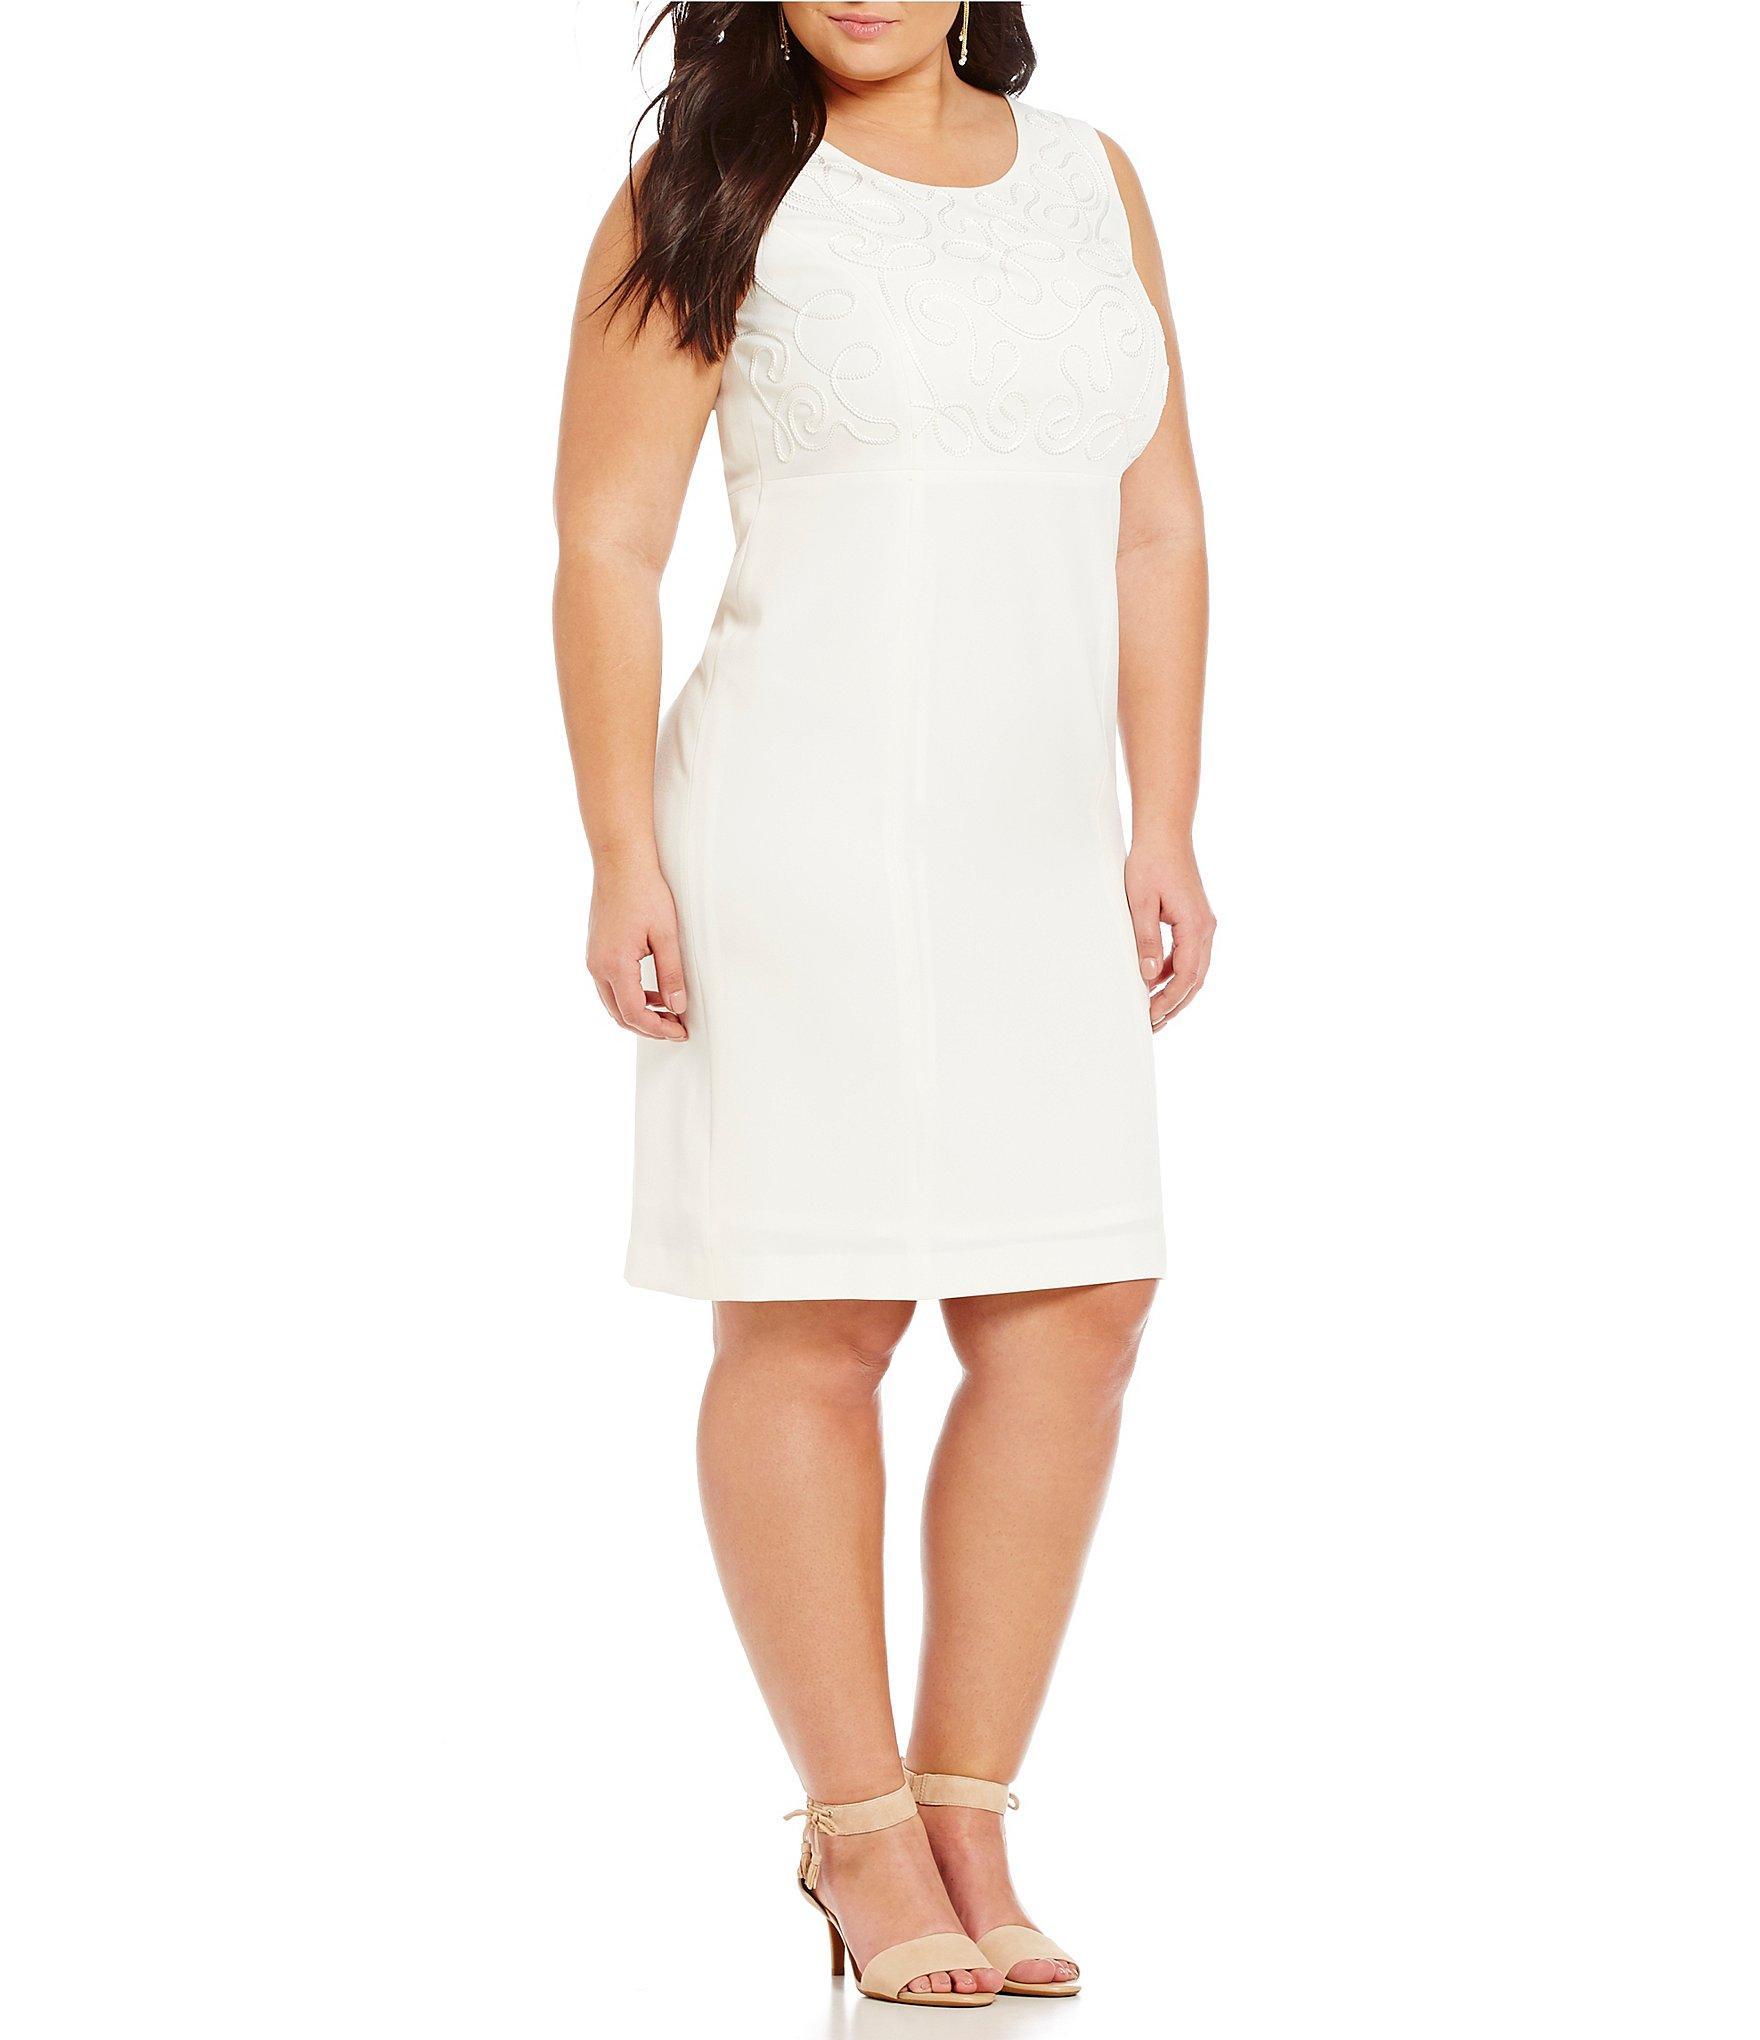 2fb271ac0957 White dresses for women Dillards - Womens Dresses